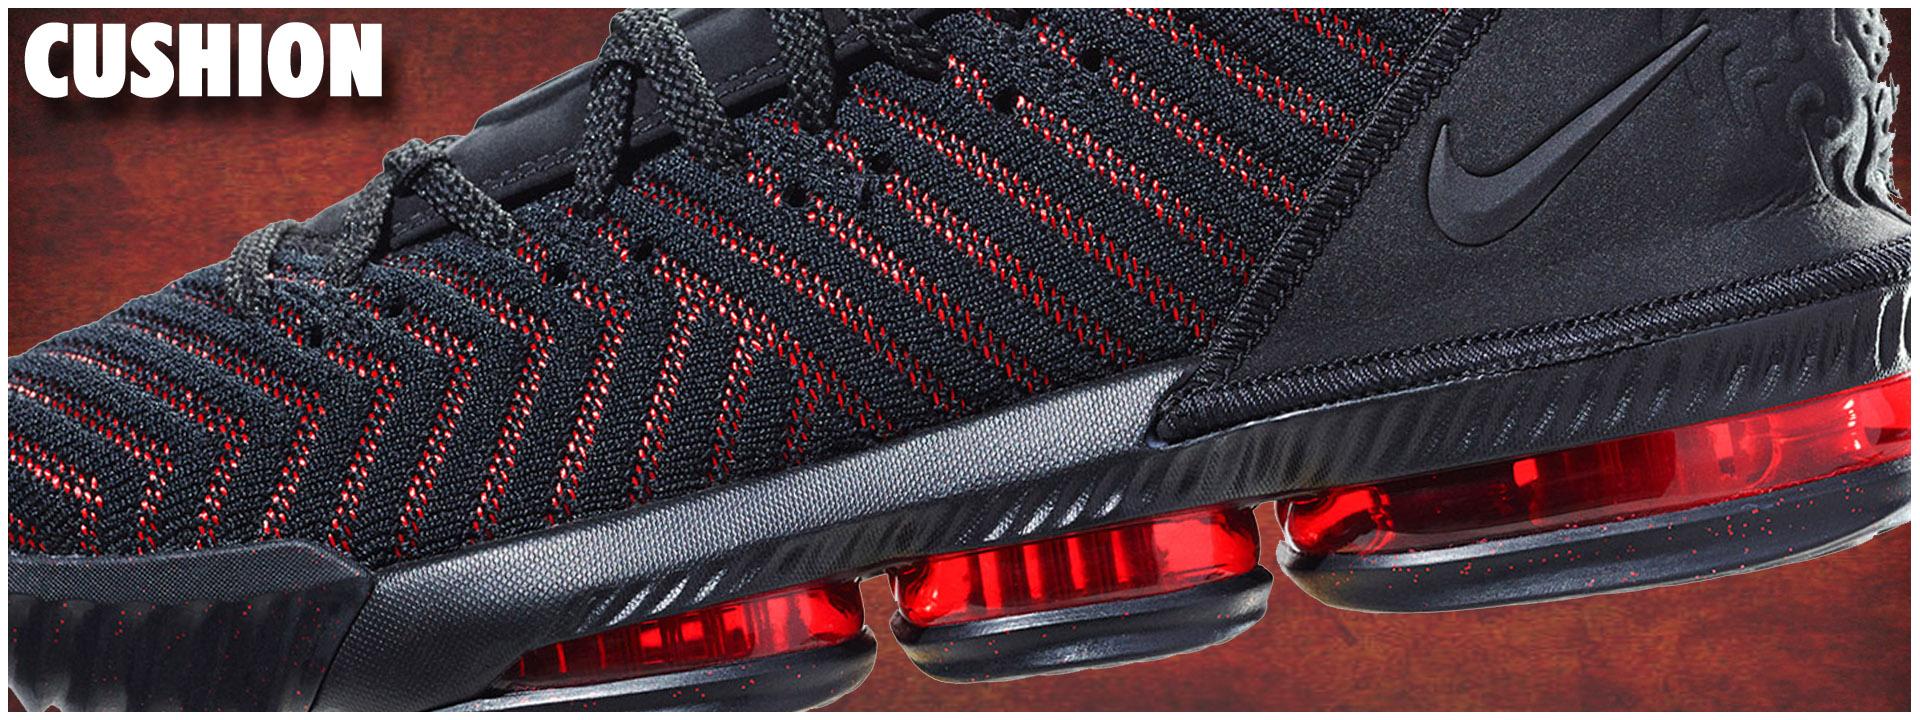 41b90b783c0 Nike-LeBron-16-Performance-Review-Cushion - WearTesters